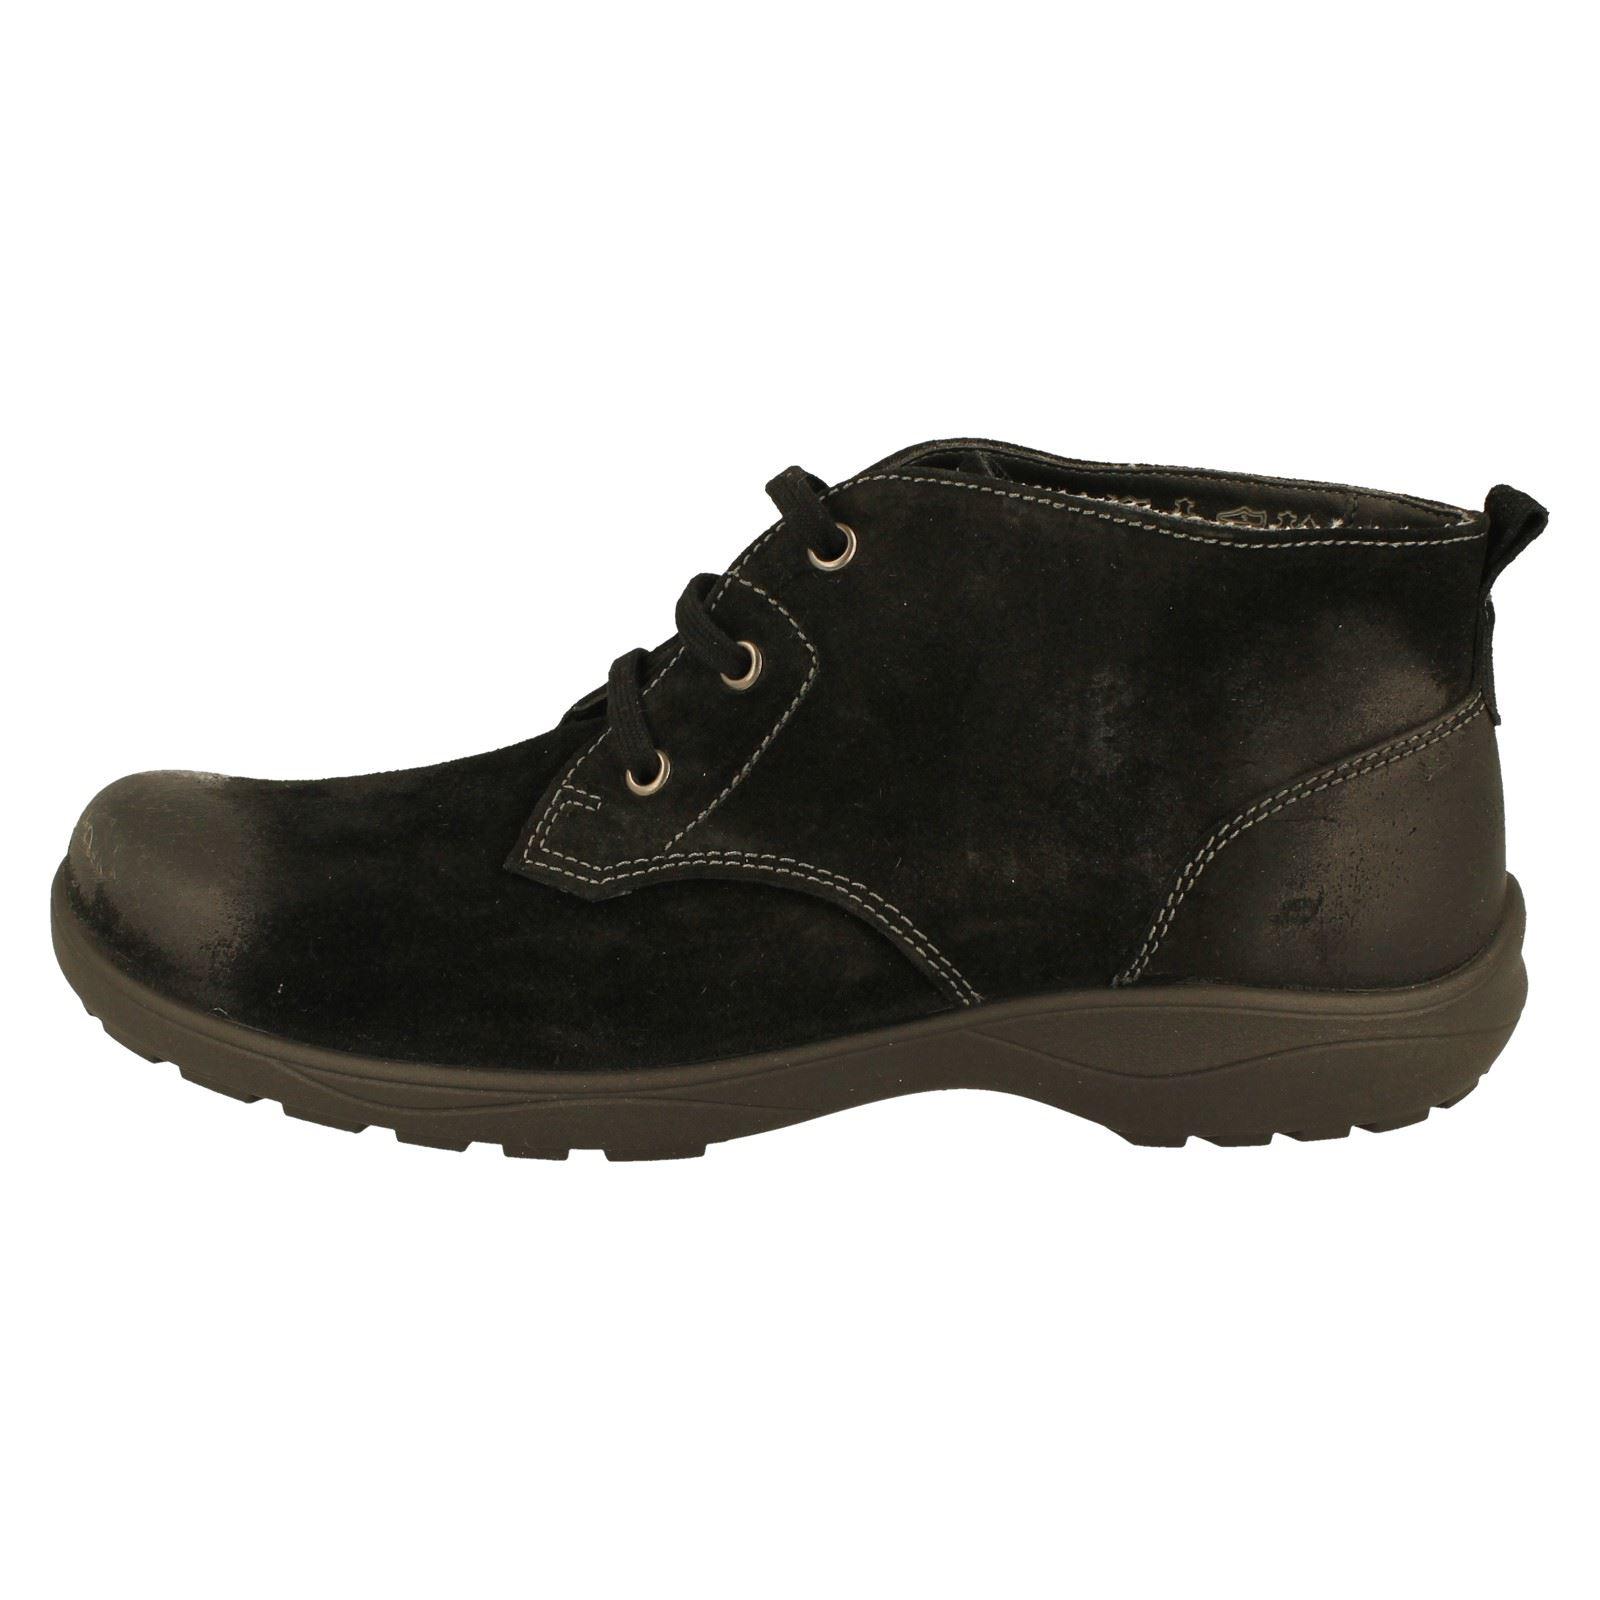 Uomo Label Rohde lace Up Stiefel Label Uomo 9952-W 1bb81c